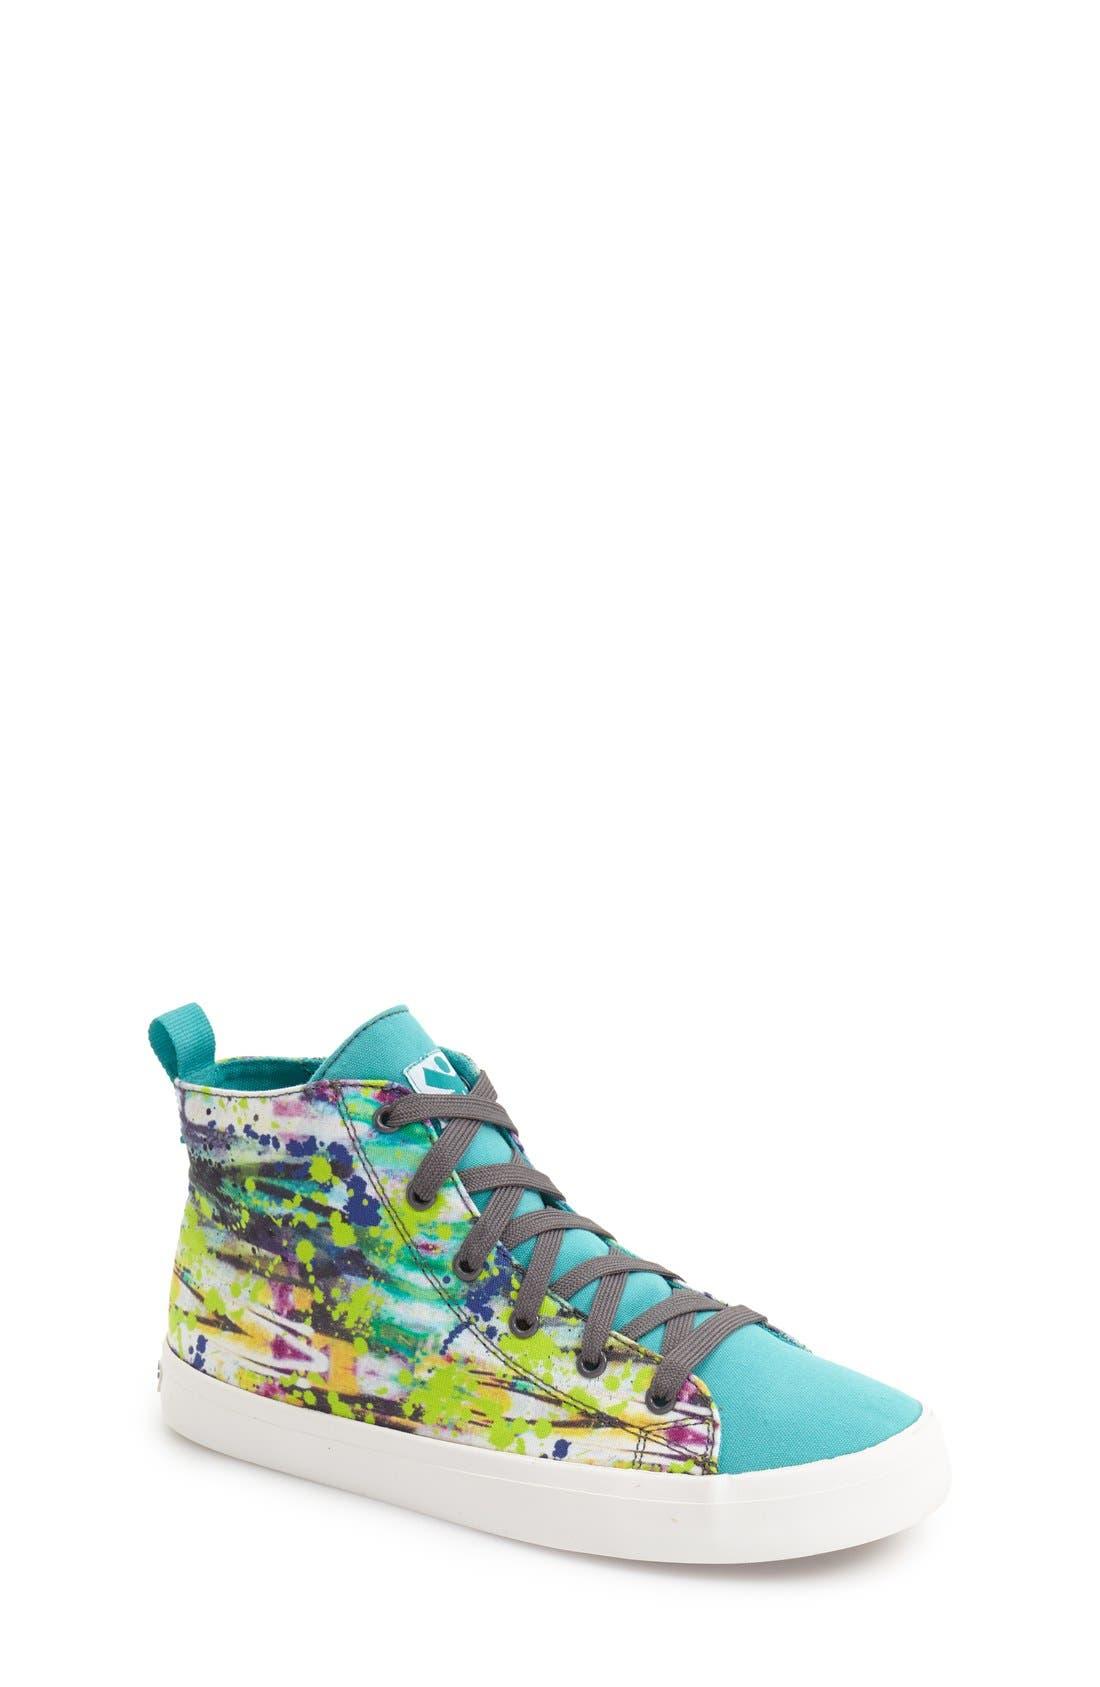 CHOOZE Spark High Top Sneaker